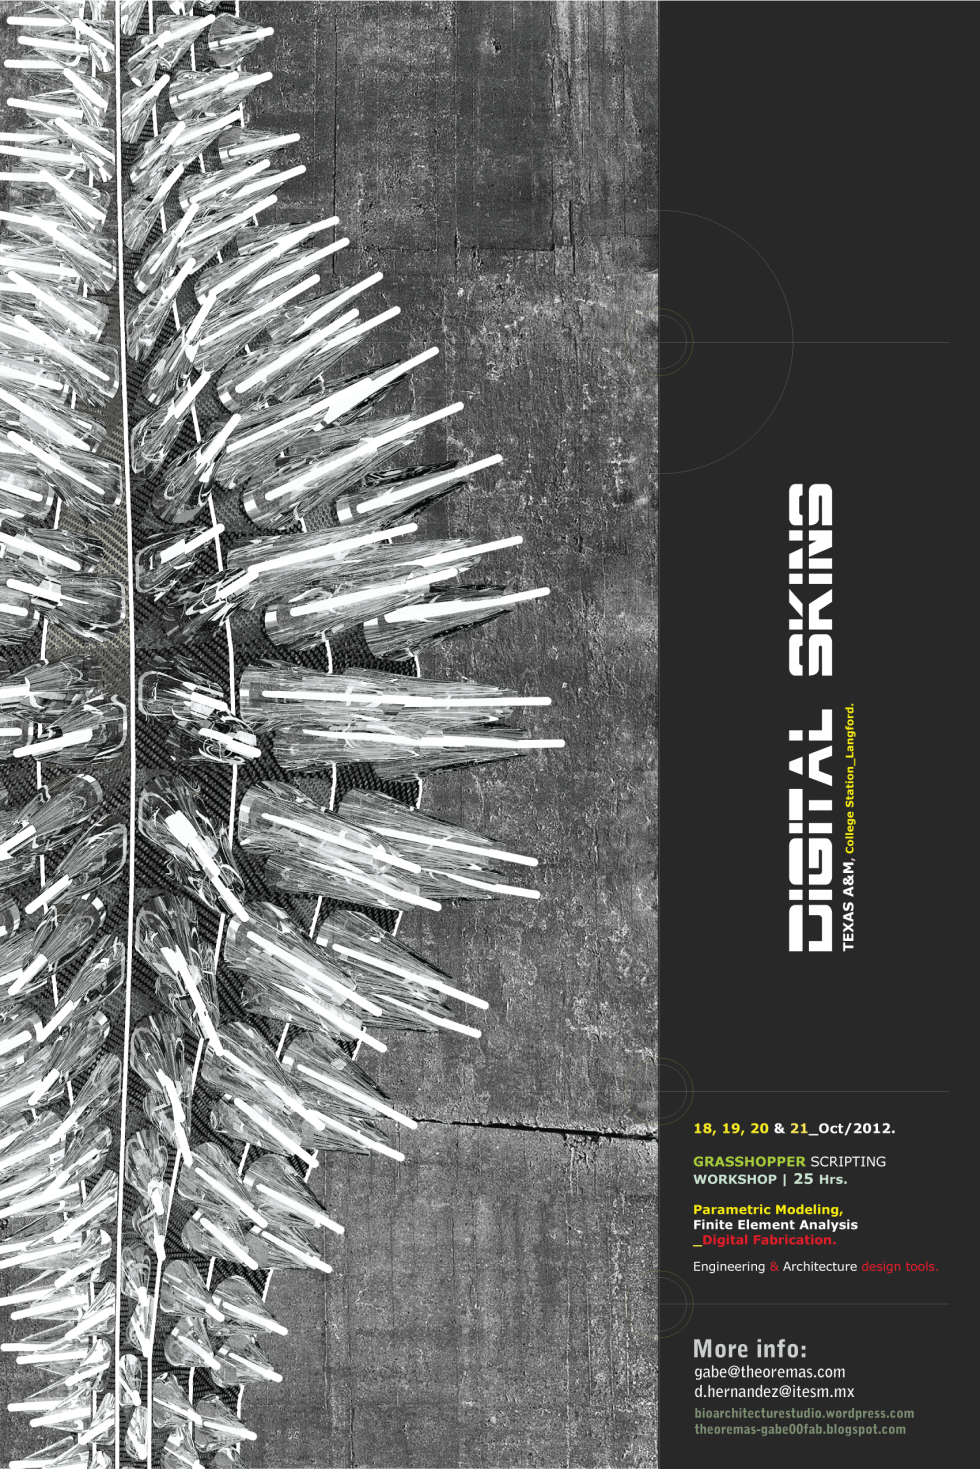 Theoremas – BIO|ARCHITECTURE STUDIO